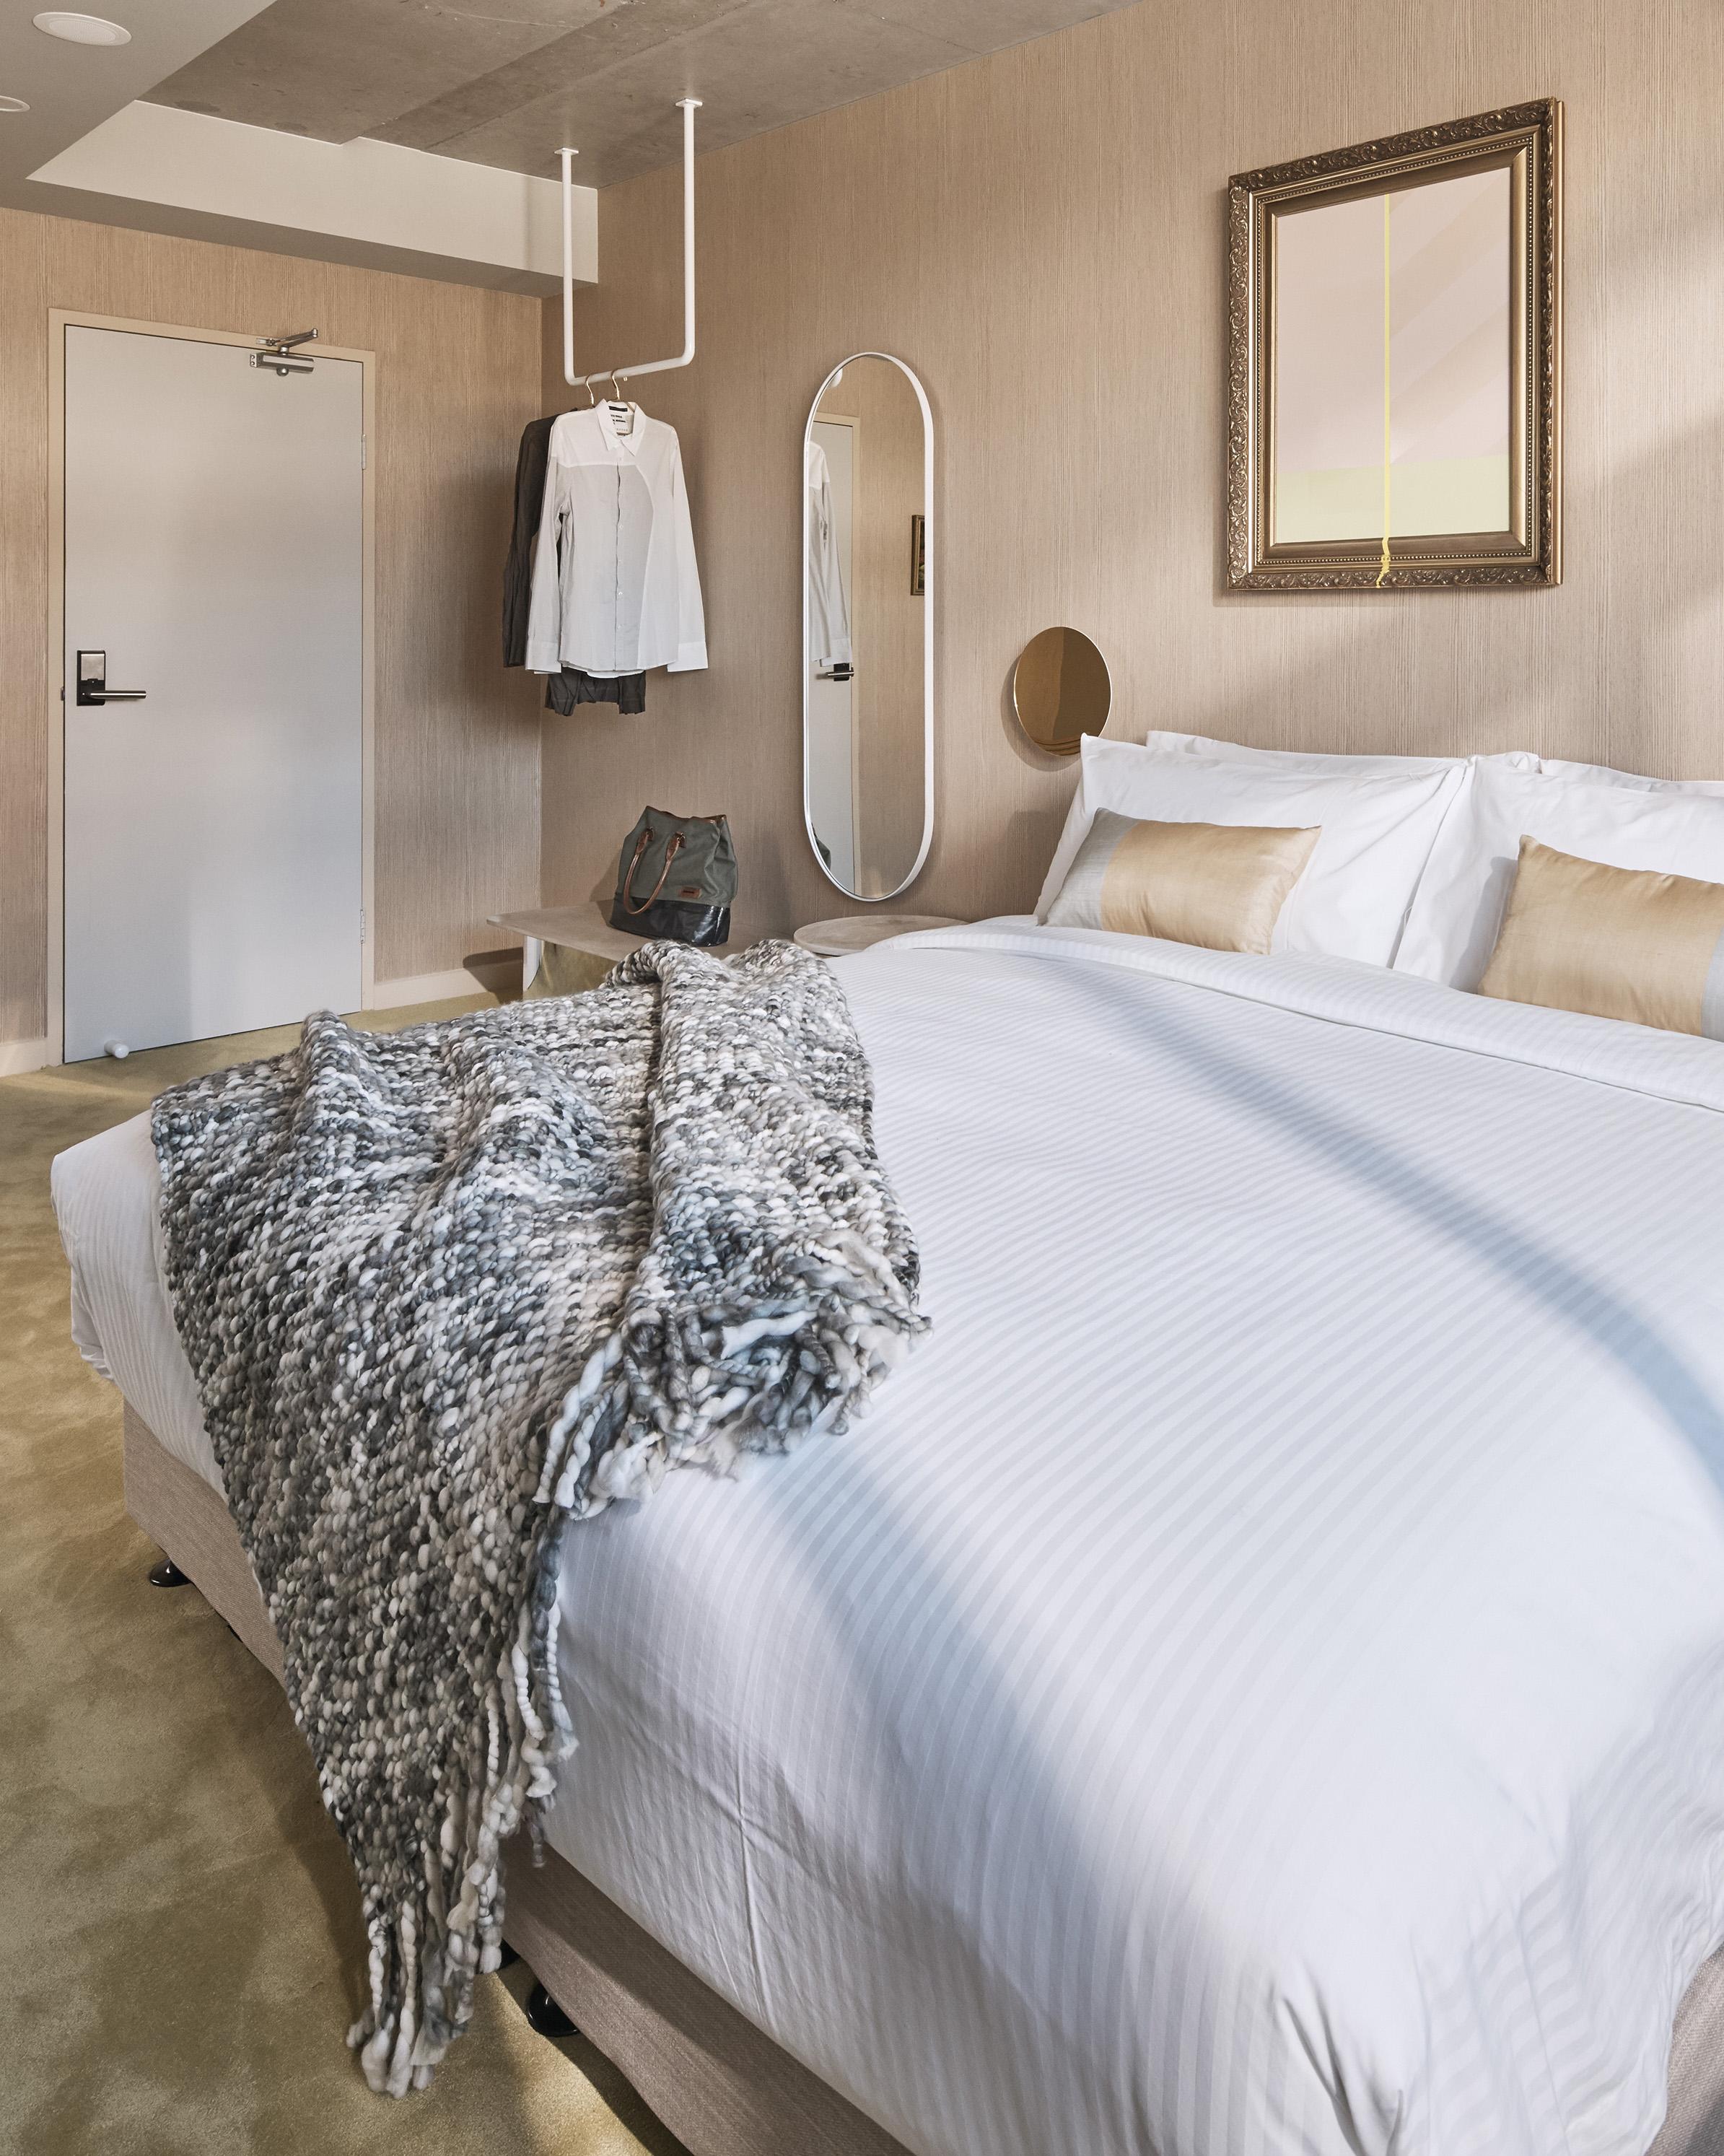 Malmo room by Willis Sheargold